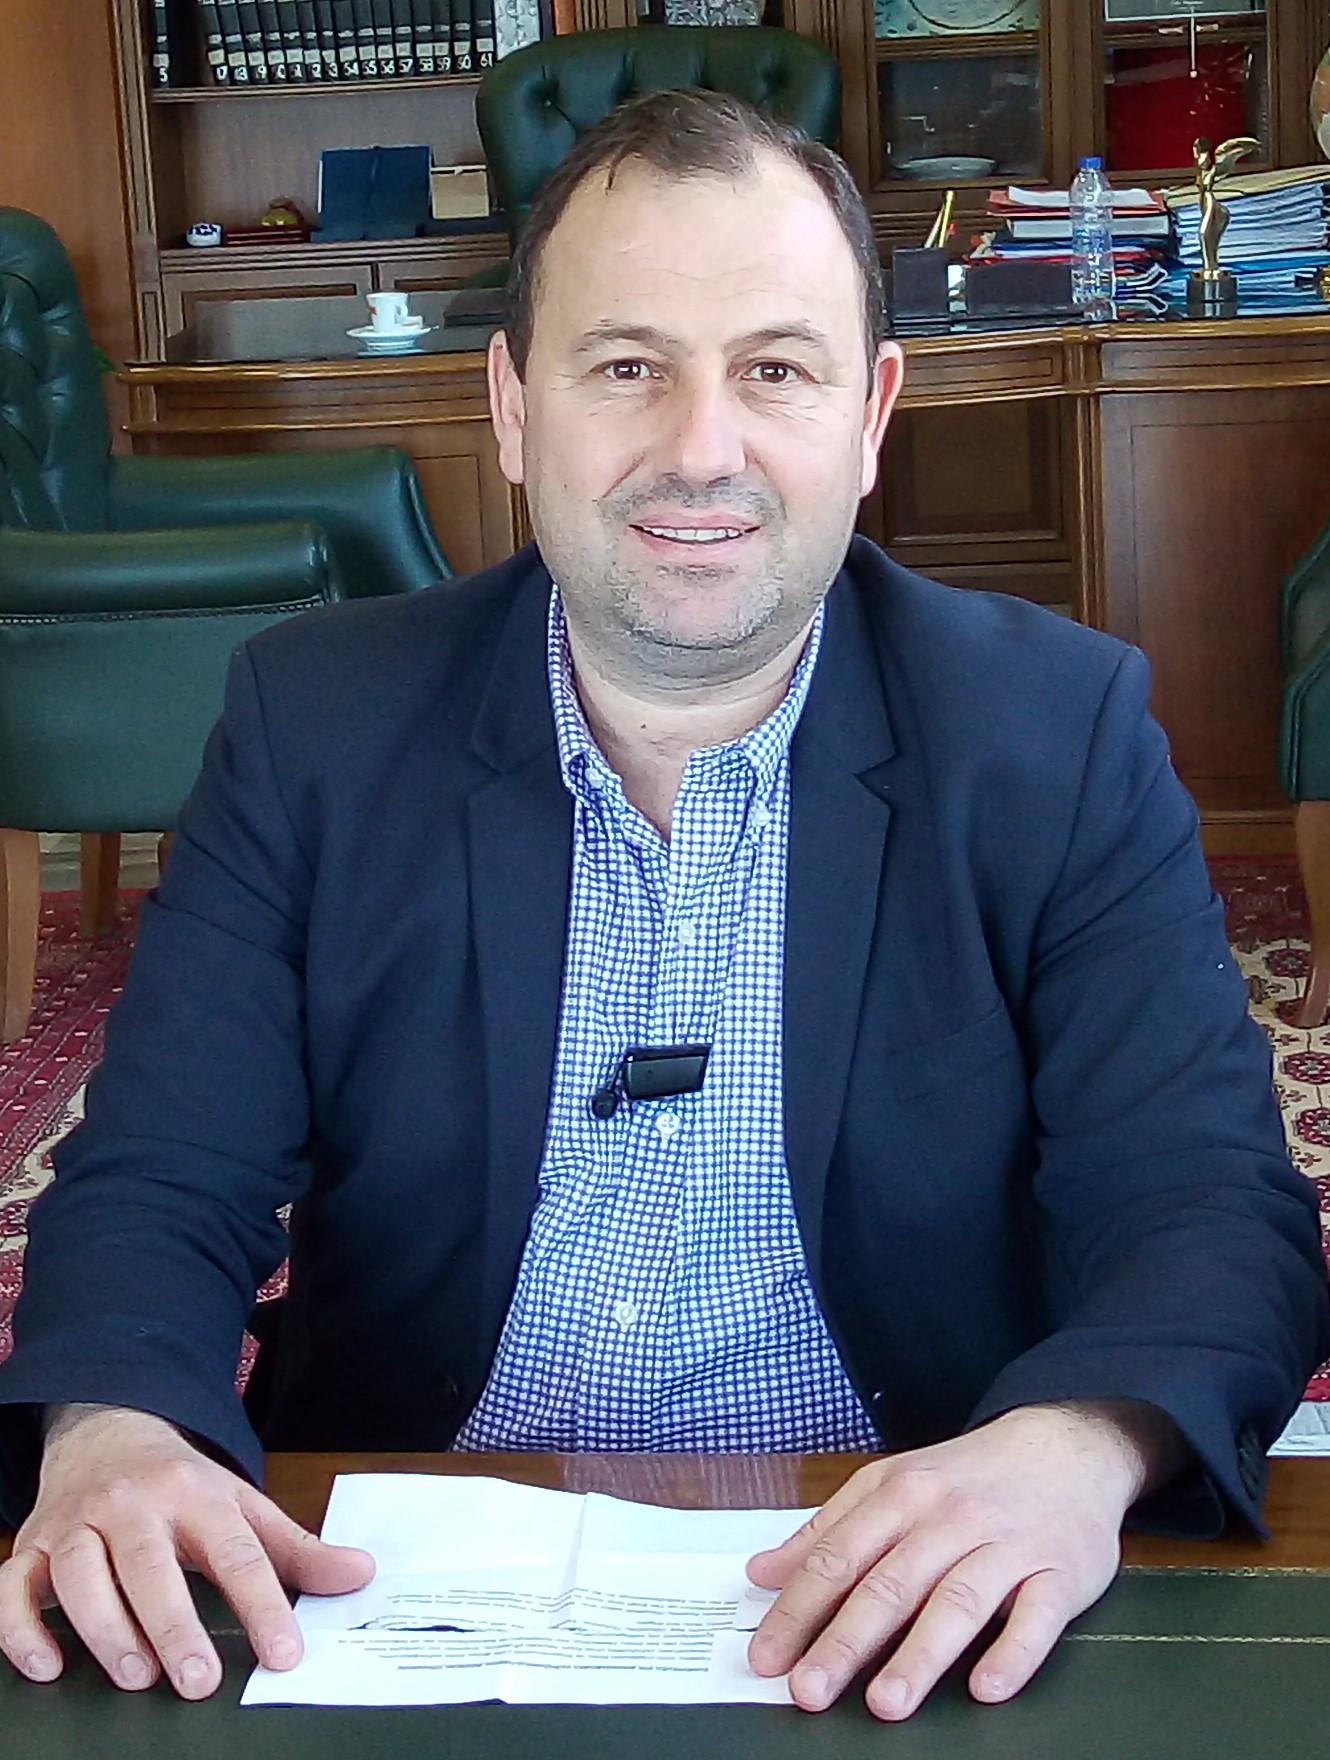 https://www.patrisnews.com/wp-content/uploads/2021/01/xaris-spiliopoulos-1.jpg